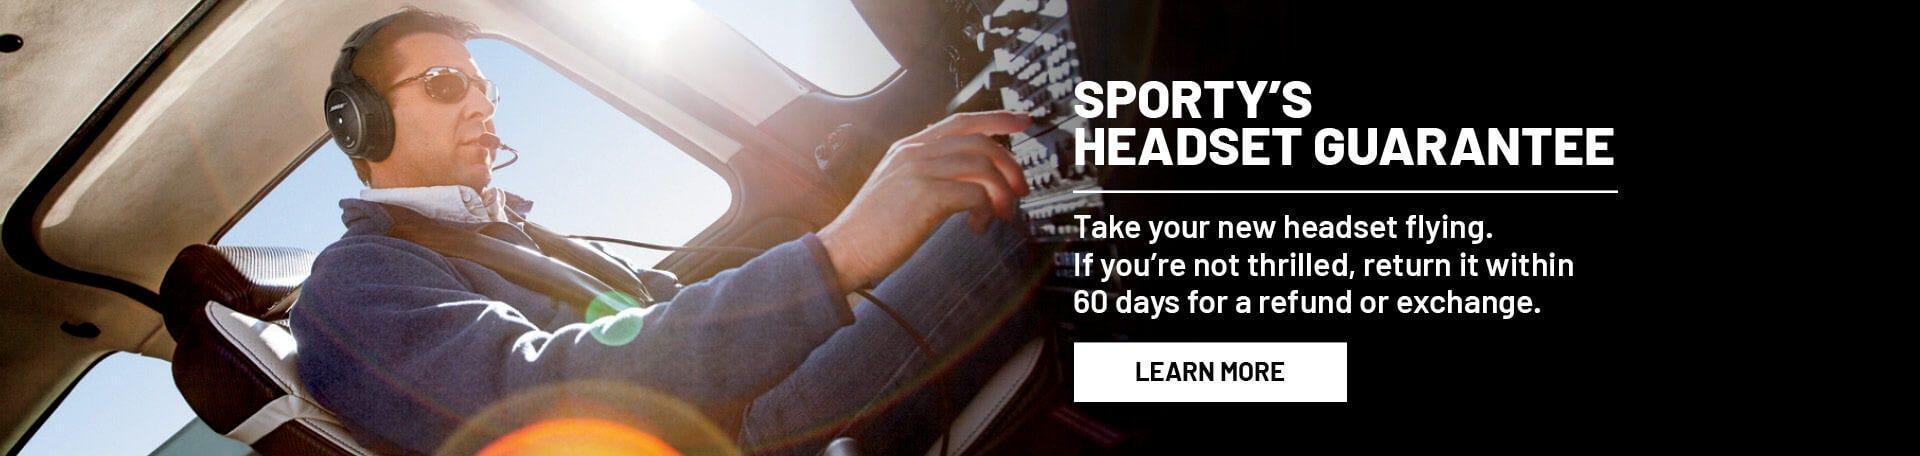 Headset Guarantee